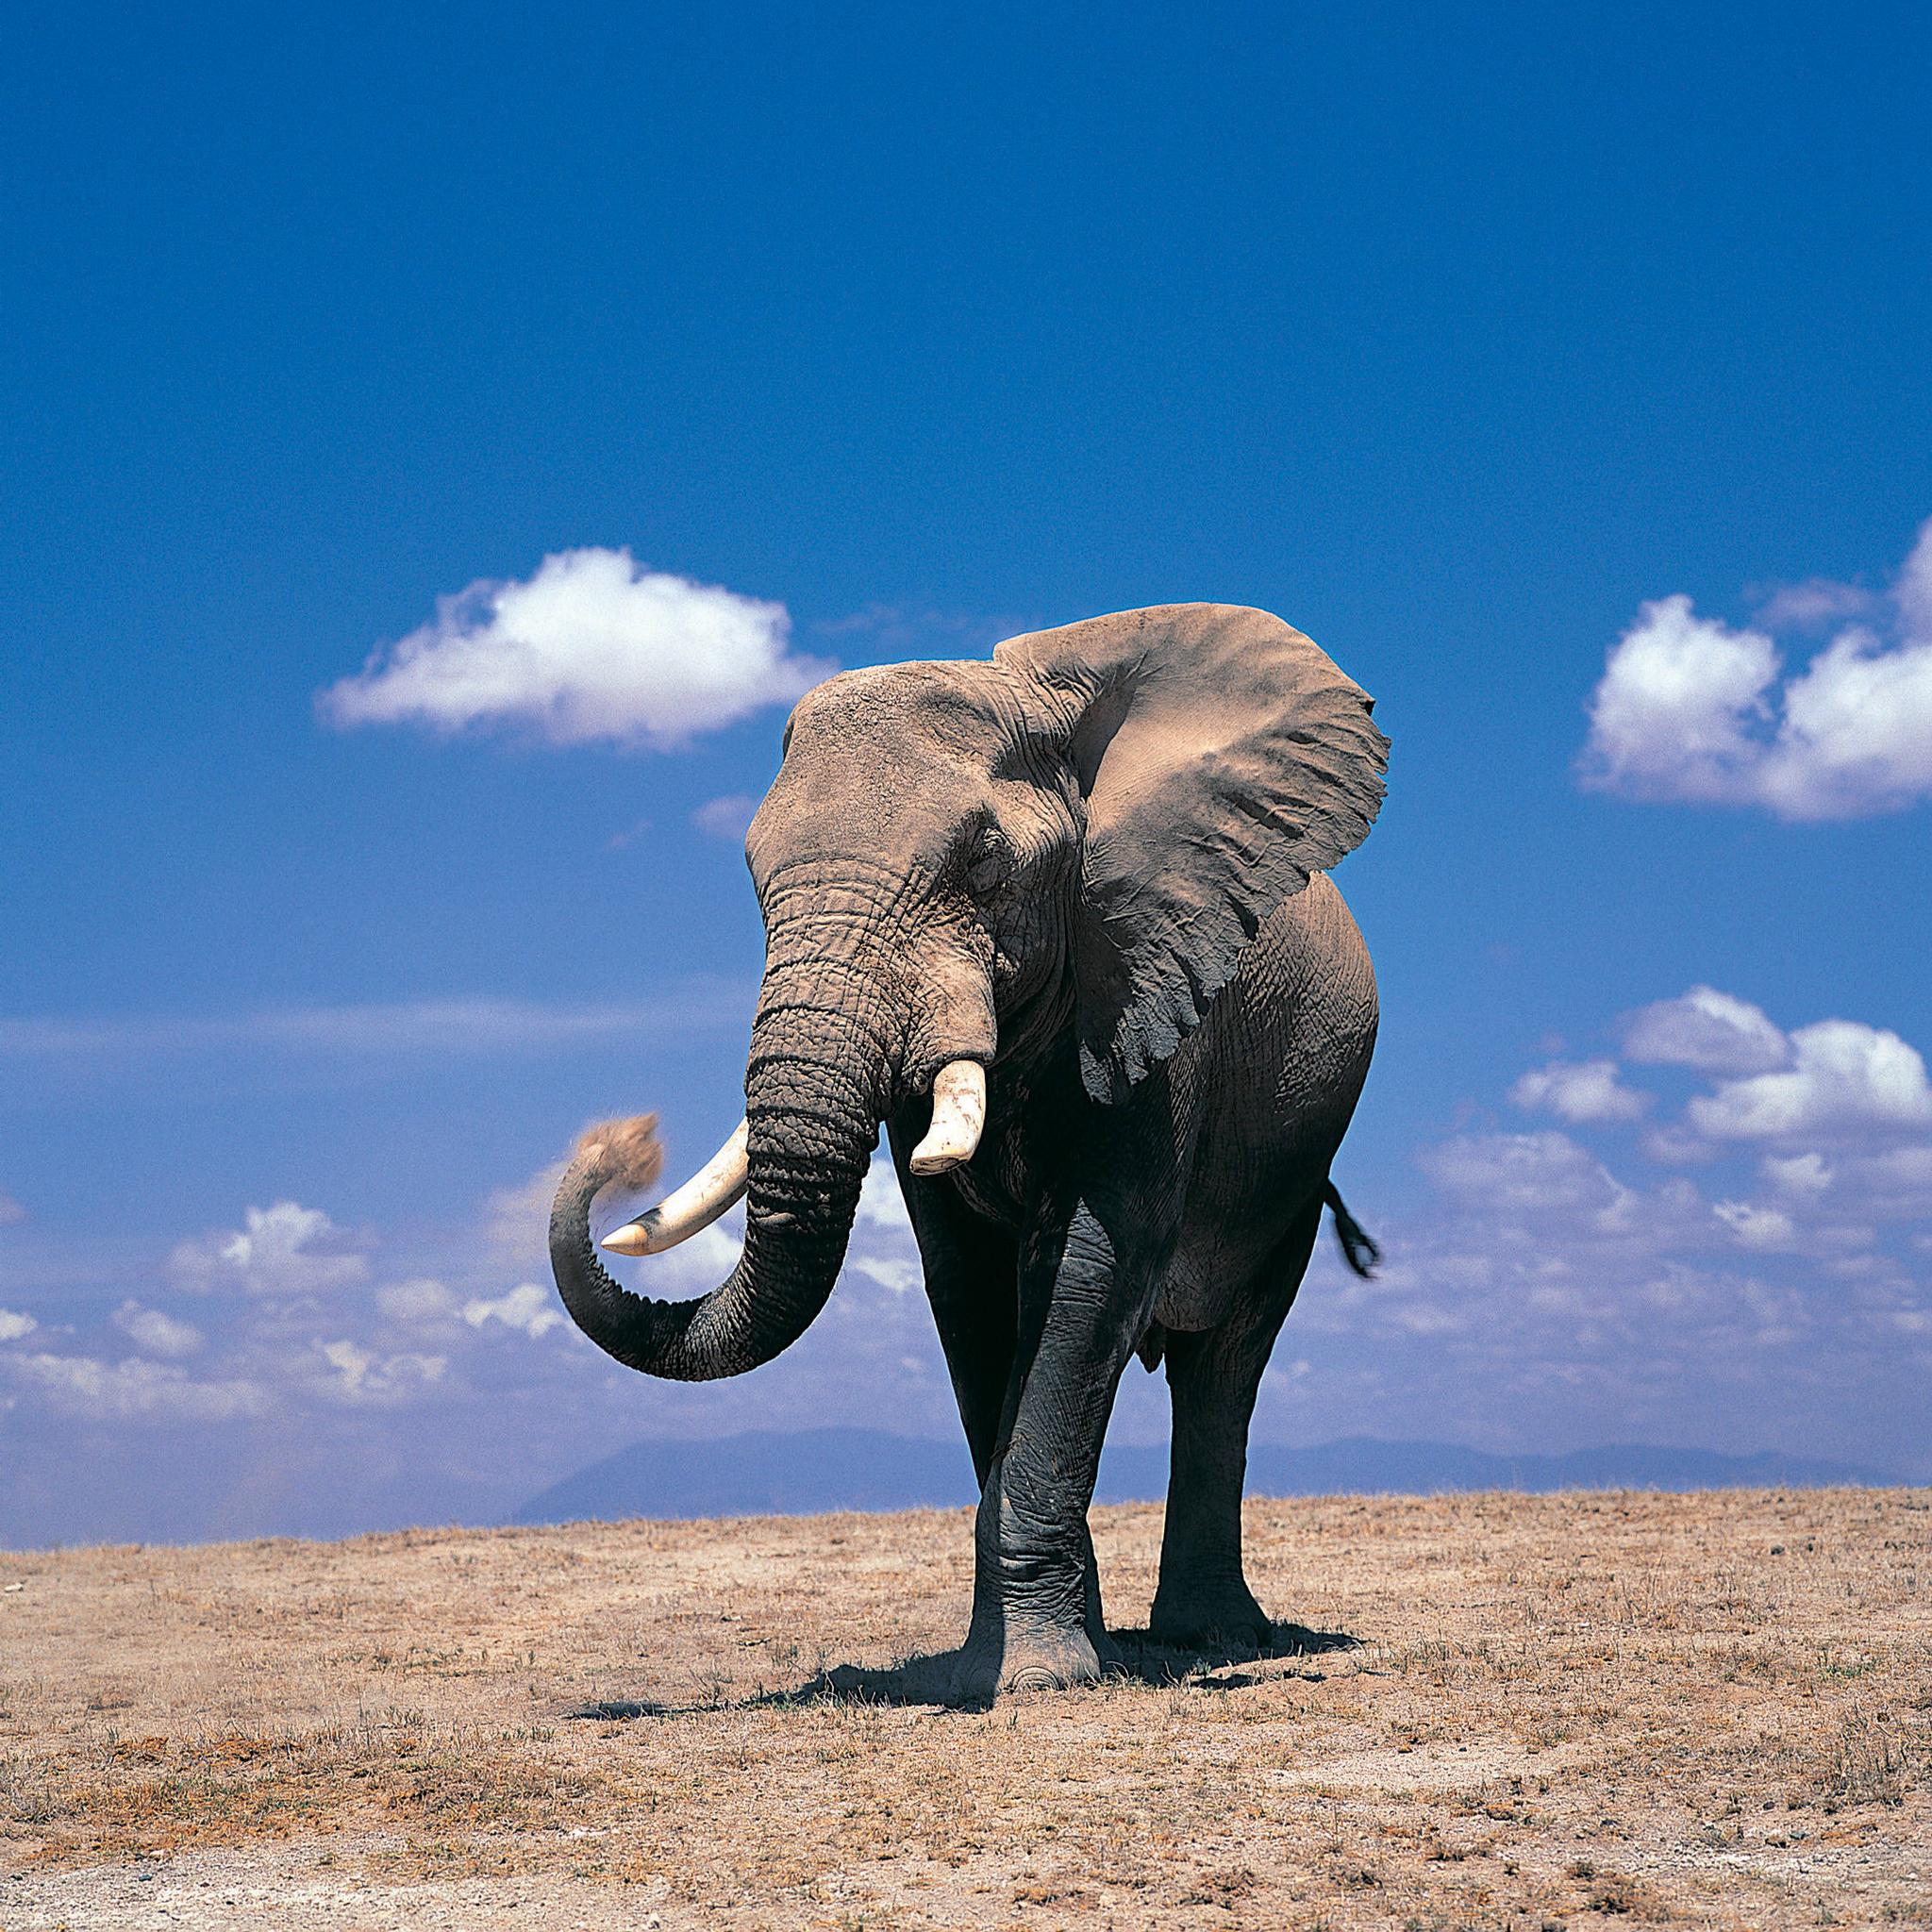 Elephant 3Wallpapers iPad Retina Elephant   iPad Retina